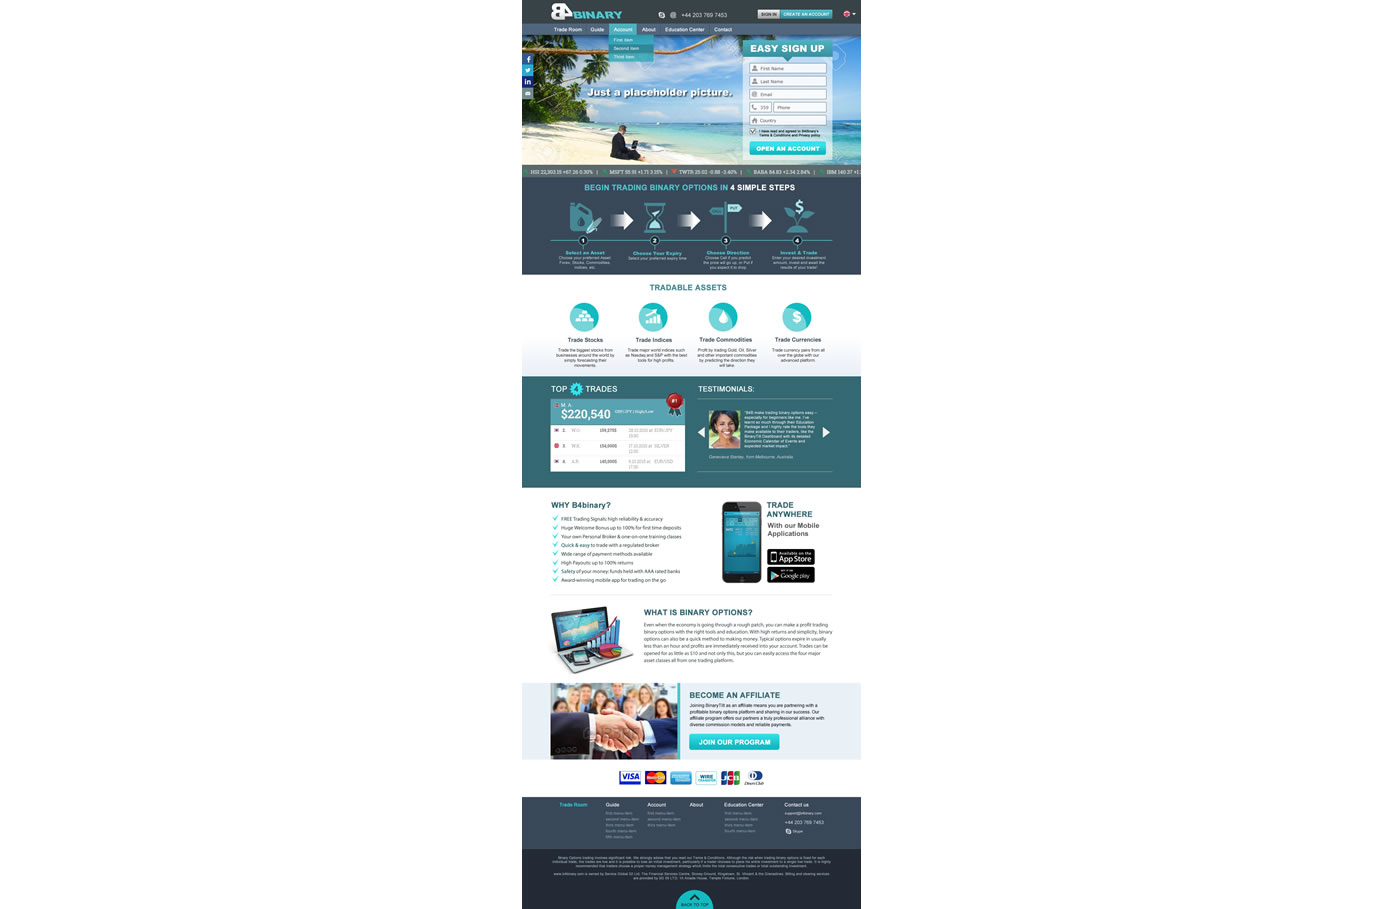 Binary options website design